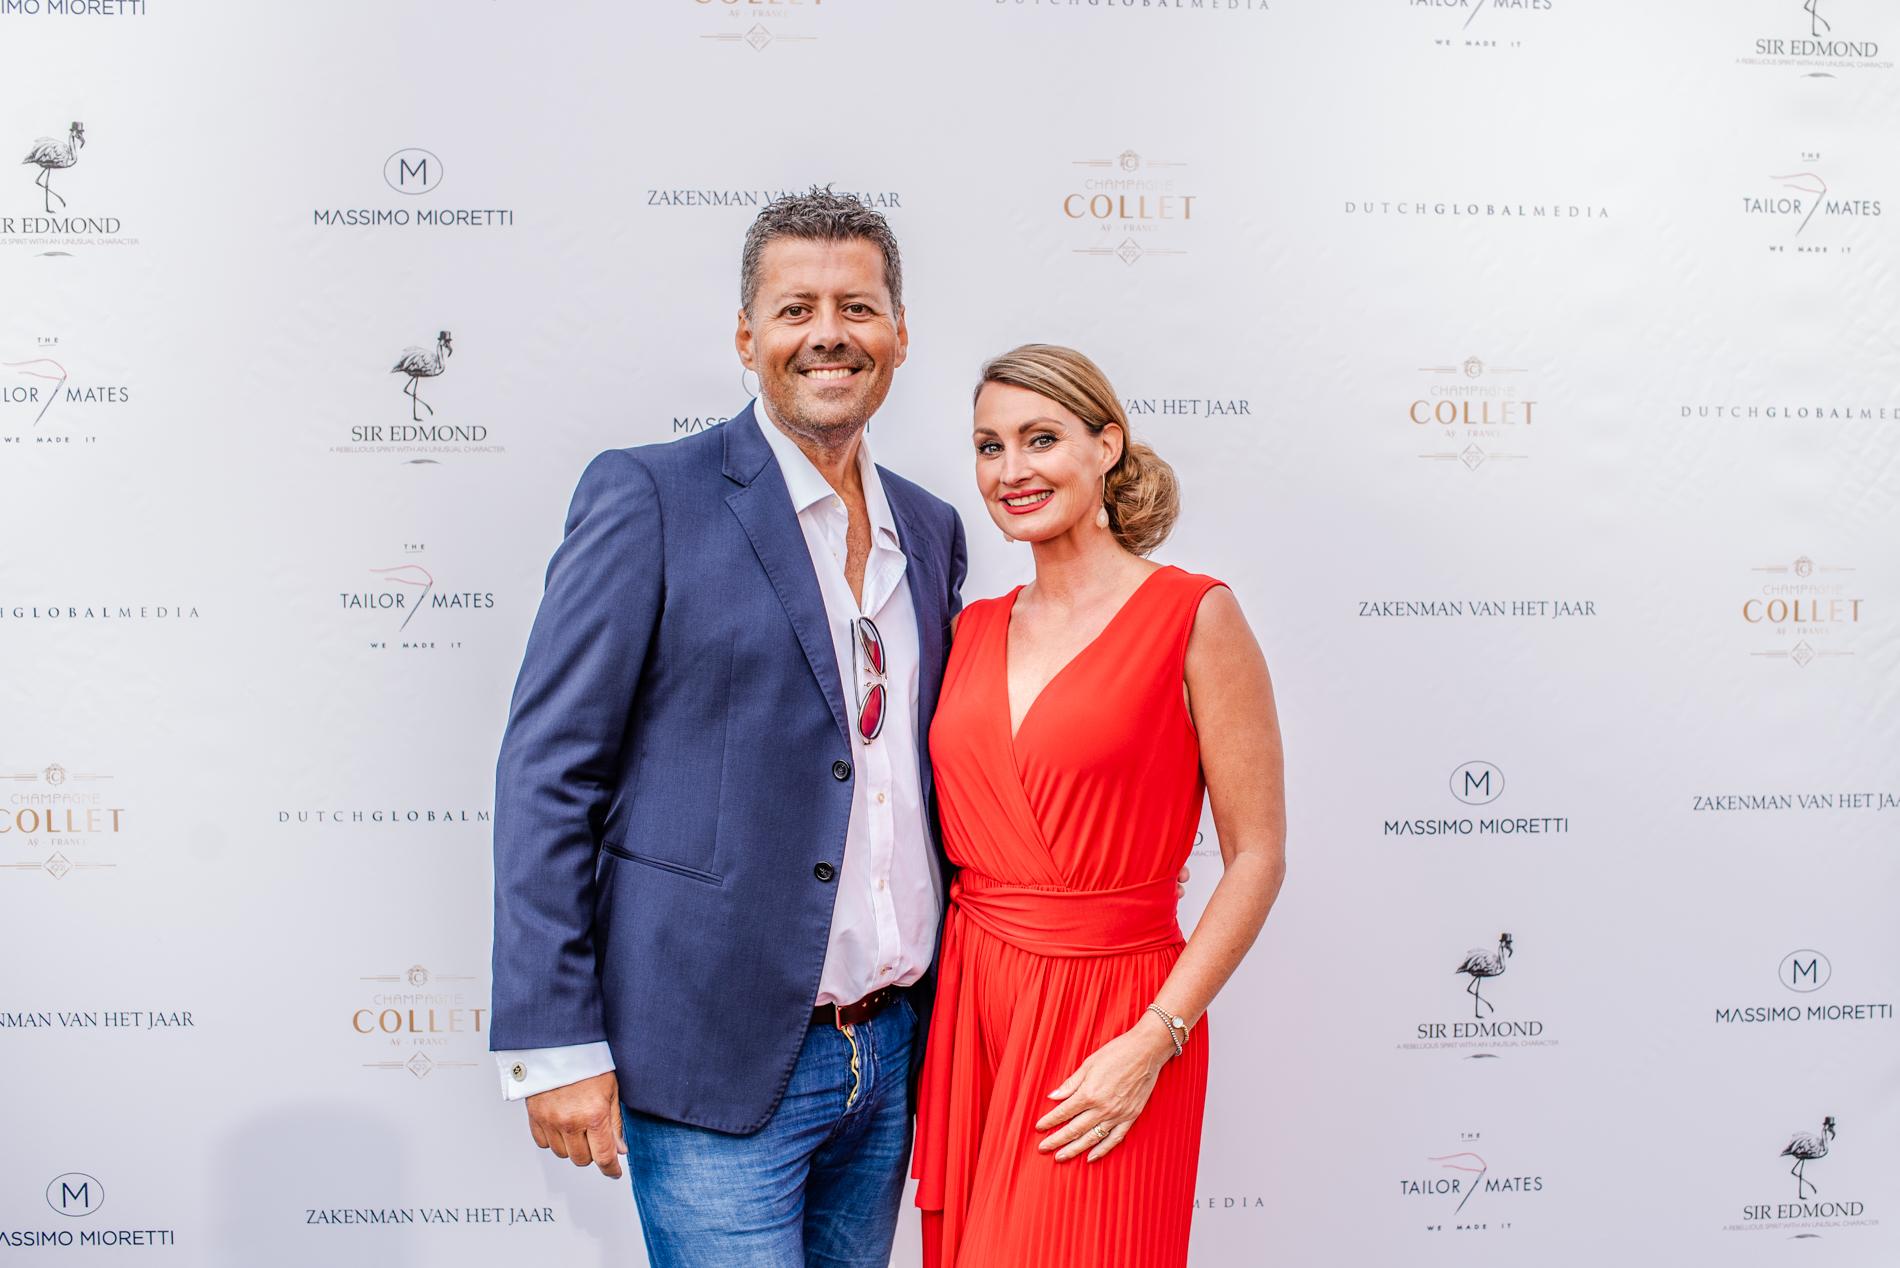 Massimo Mioretti Zakenman van het Jaar – Dutch Global Media – Marc Langeveld en Anne-Marie van Leggelo